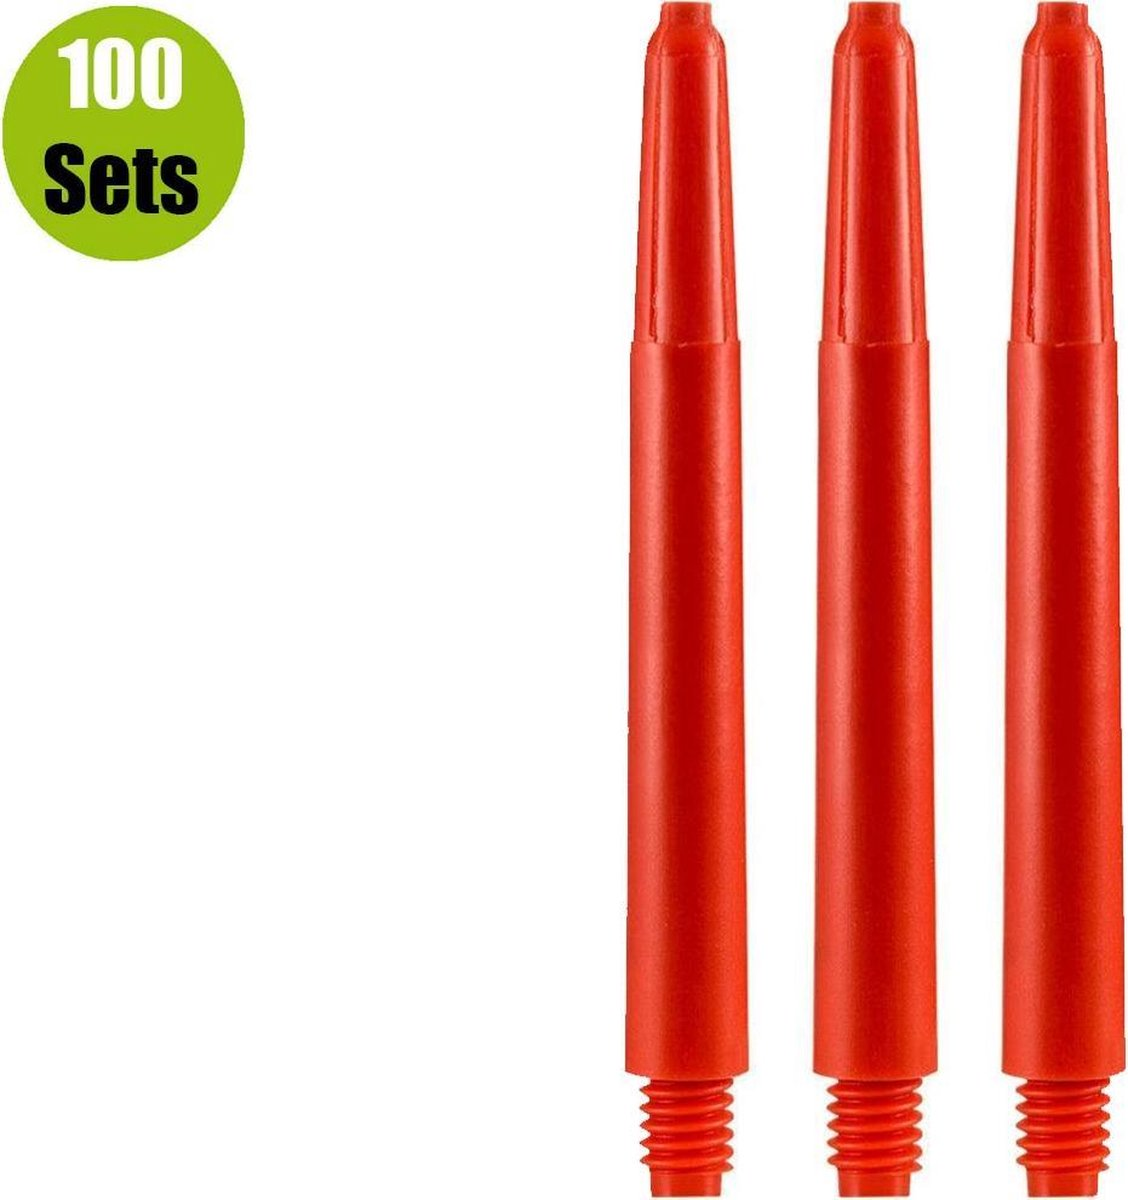 Nylon Dart Shafts - Rood - Short - (100 Sets)